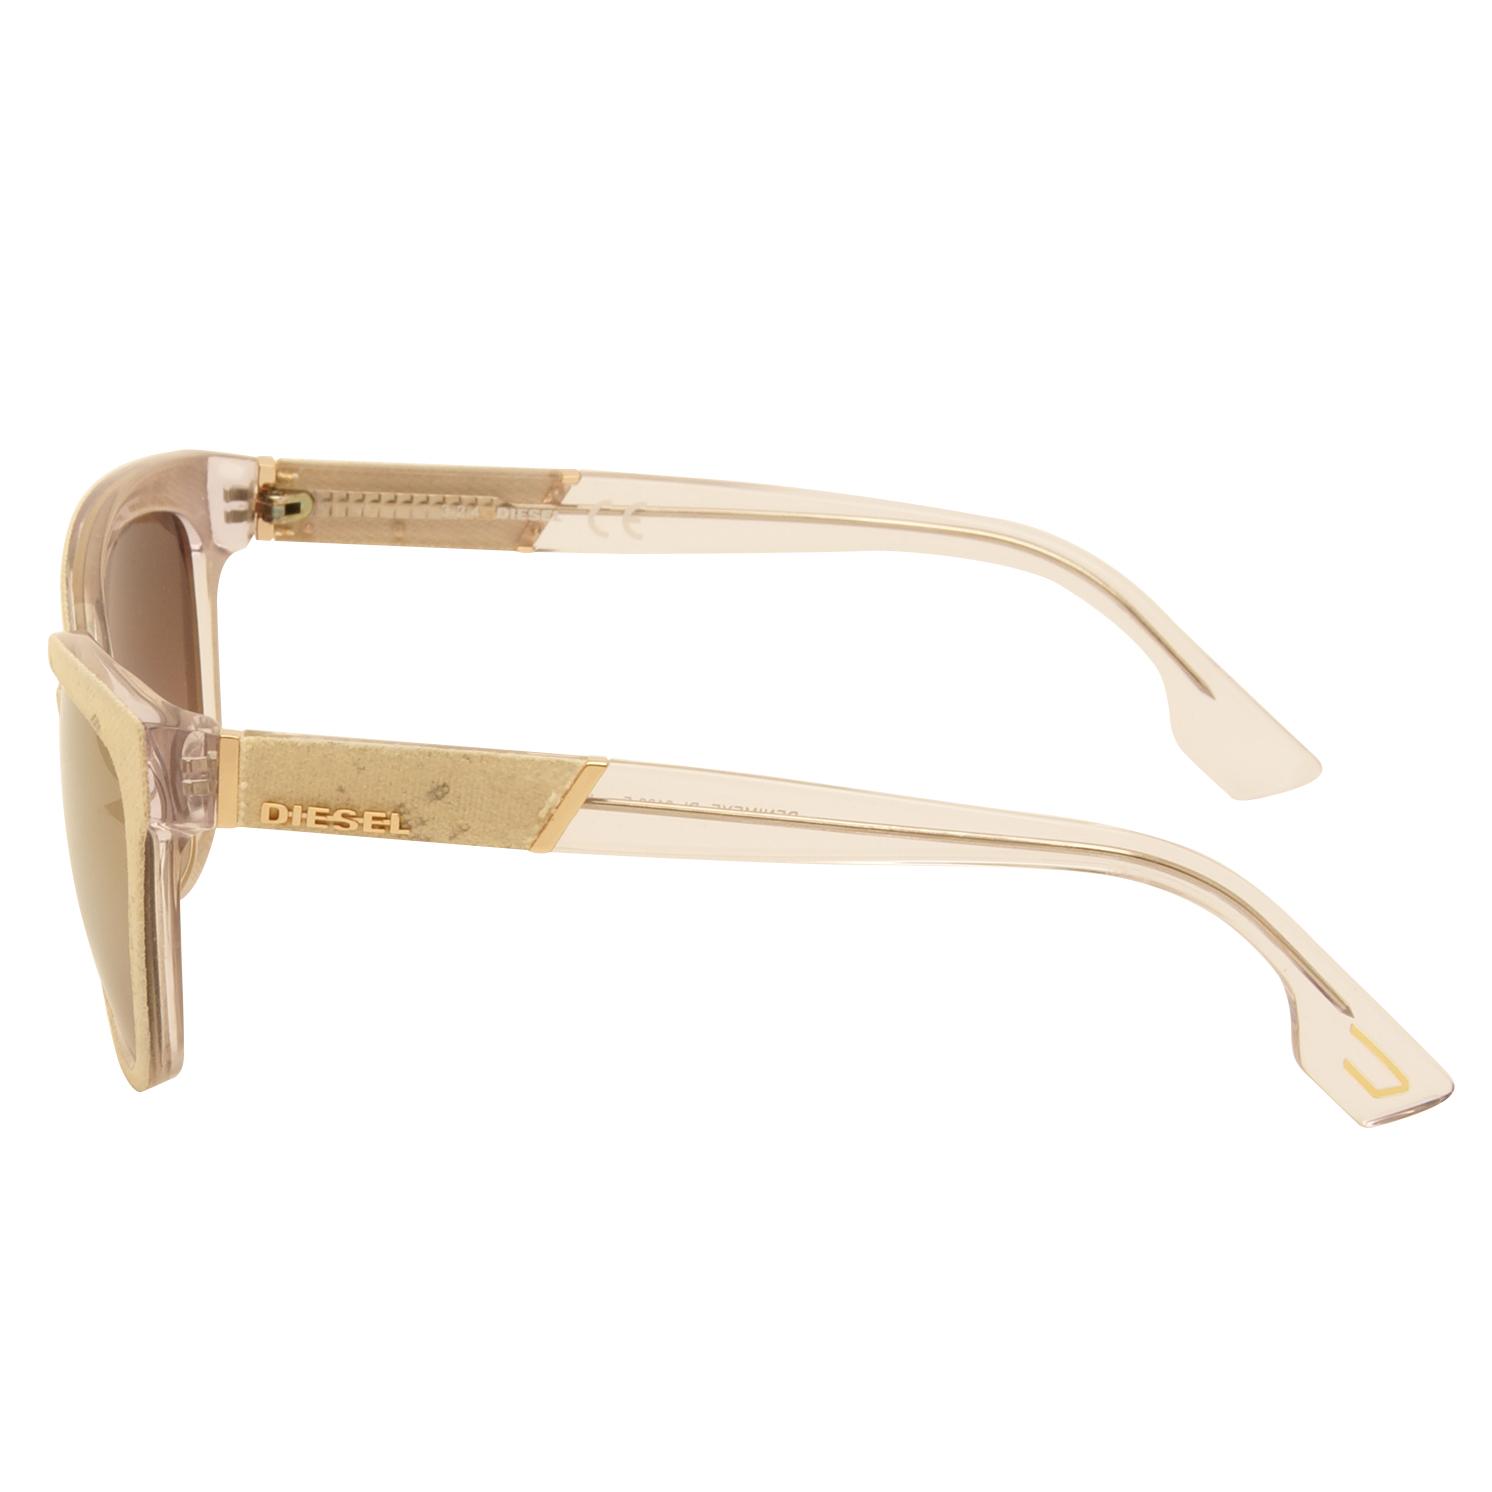 Diesel – Cream Denim Cat Eye Style Sunglasses with Case